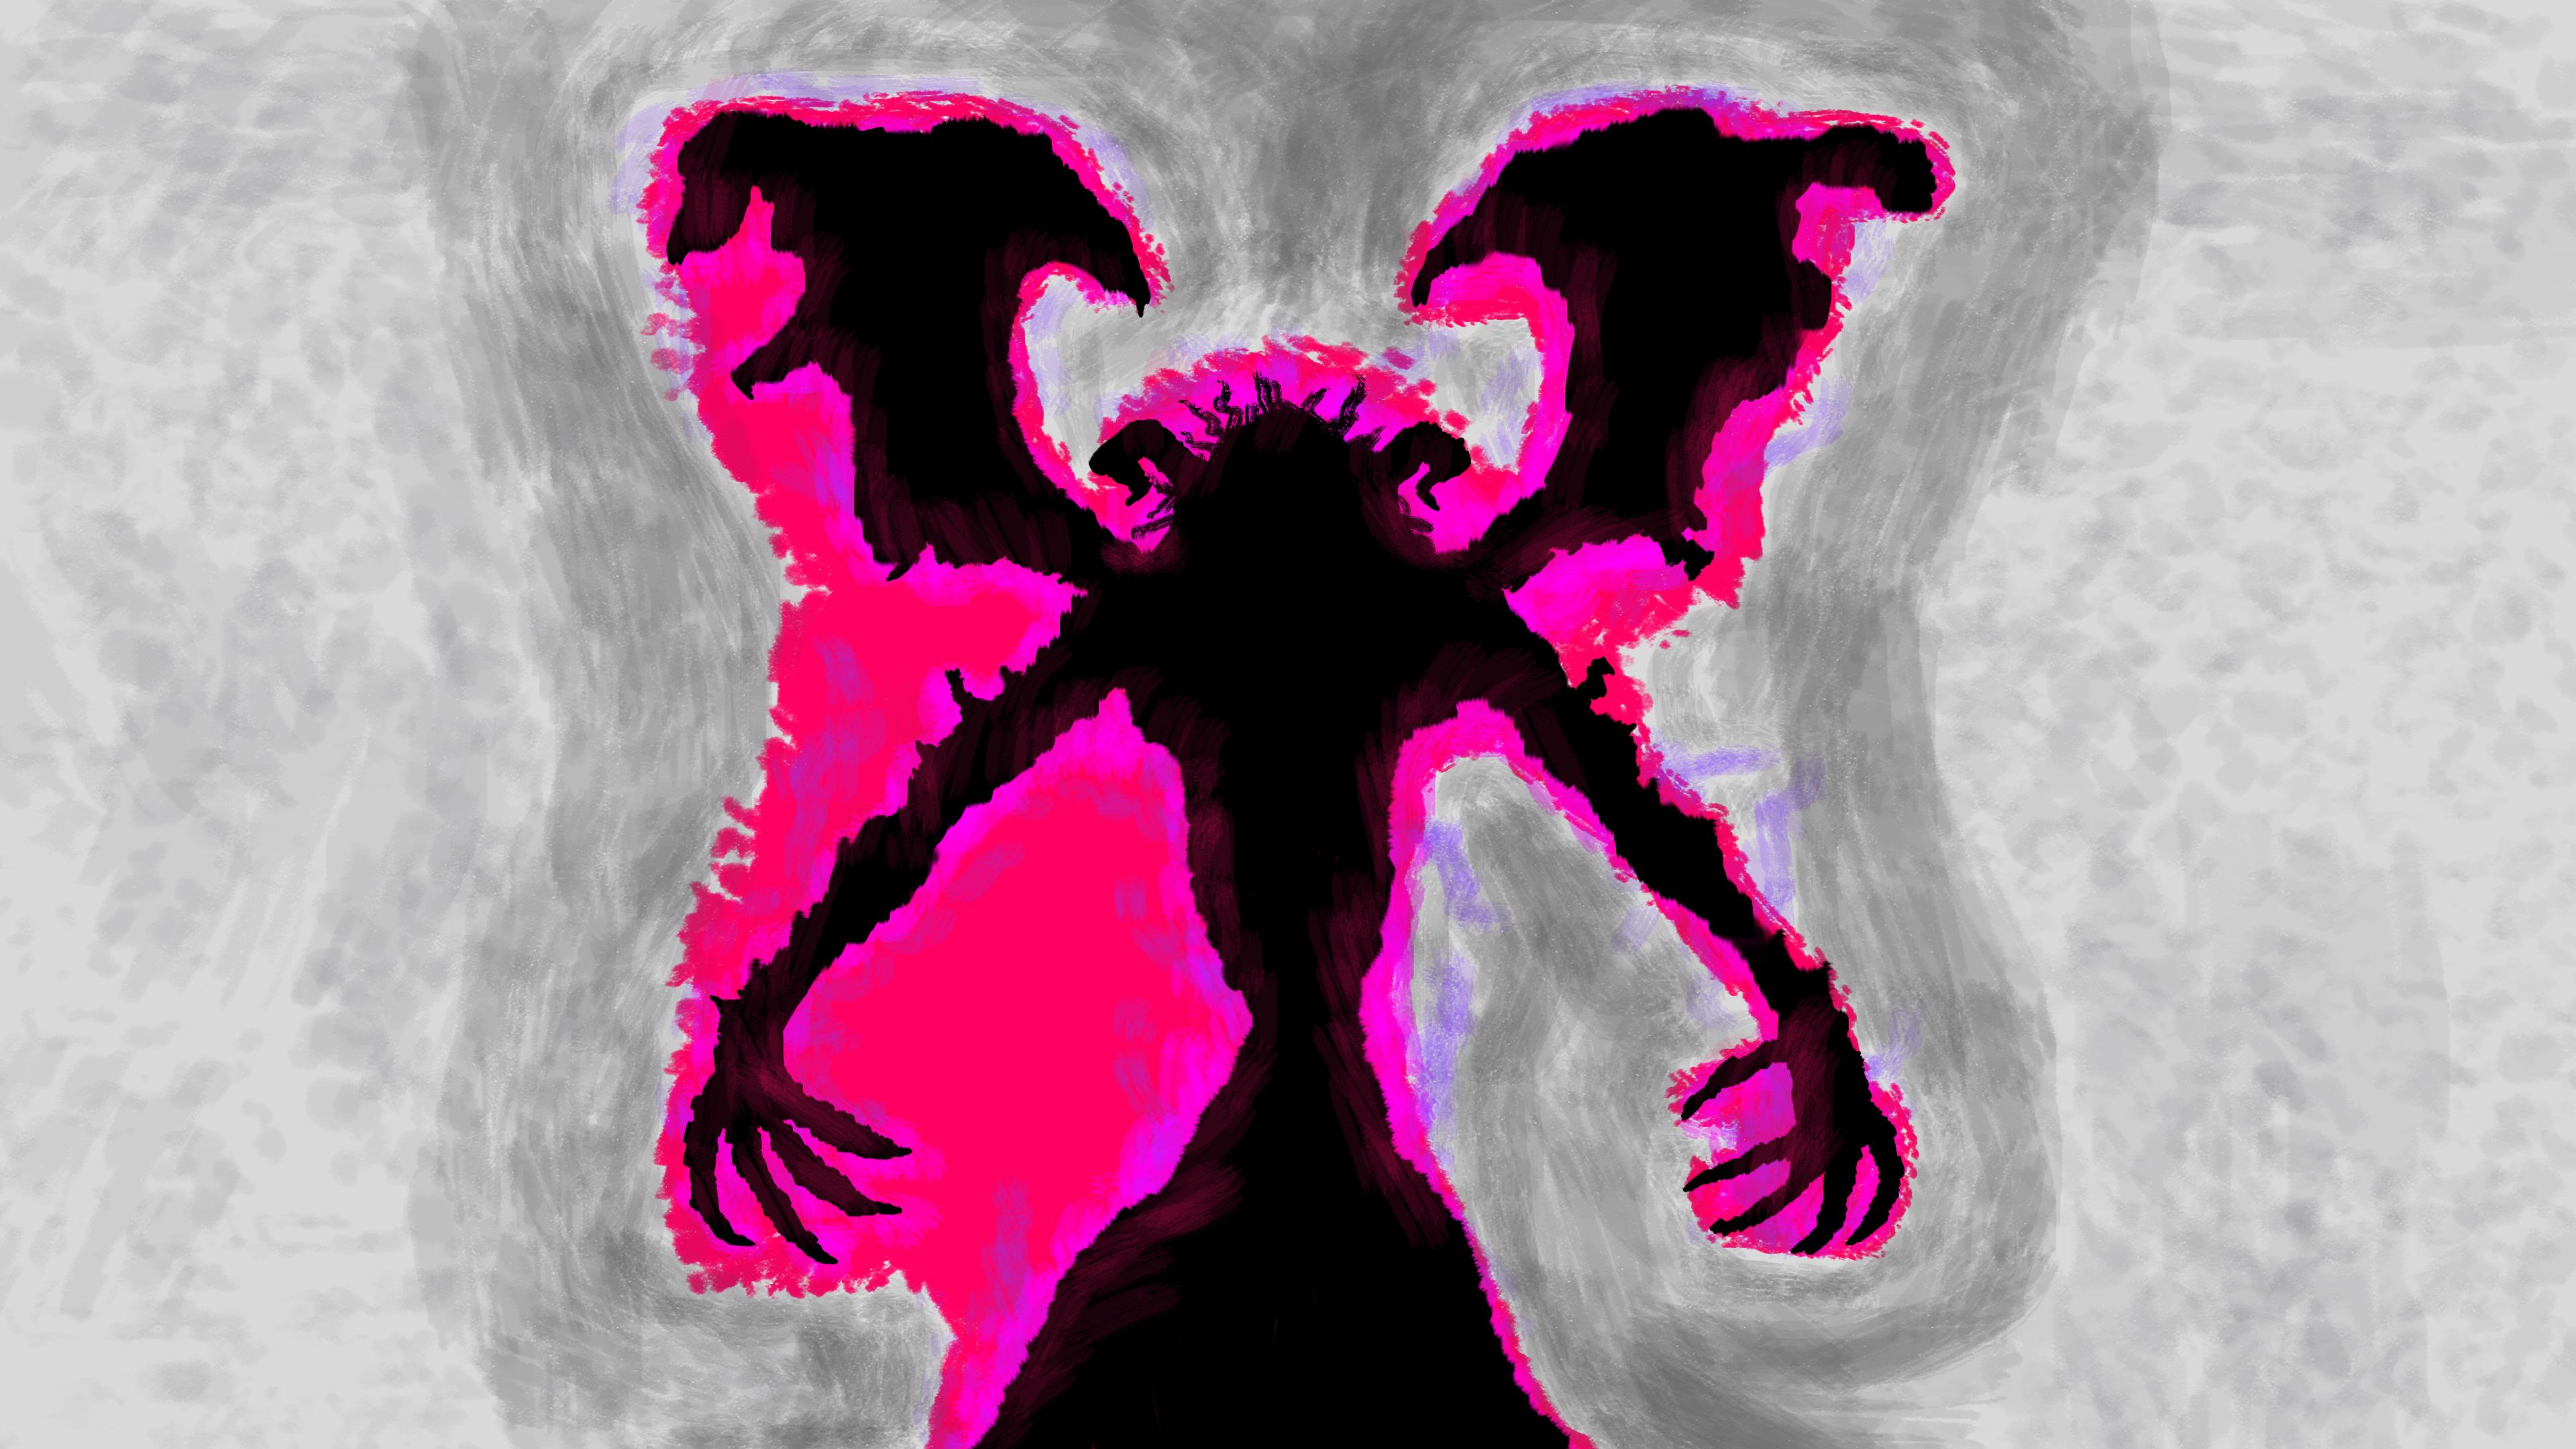 Black Clover Demon 4k Ultra HD Wallpaper   Background ...